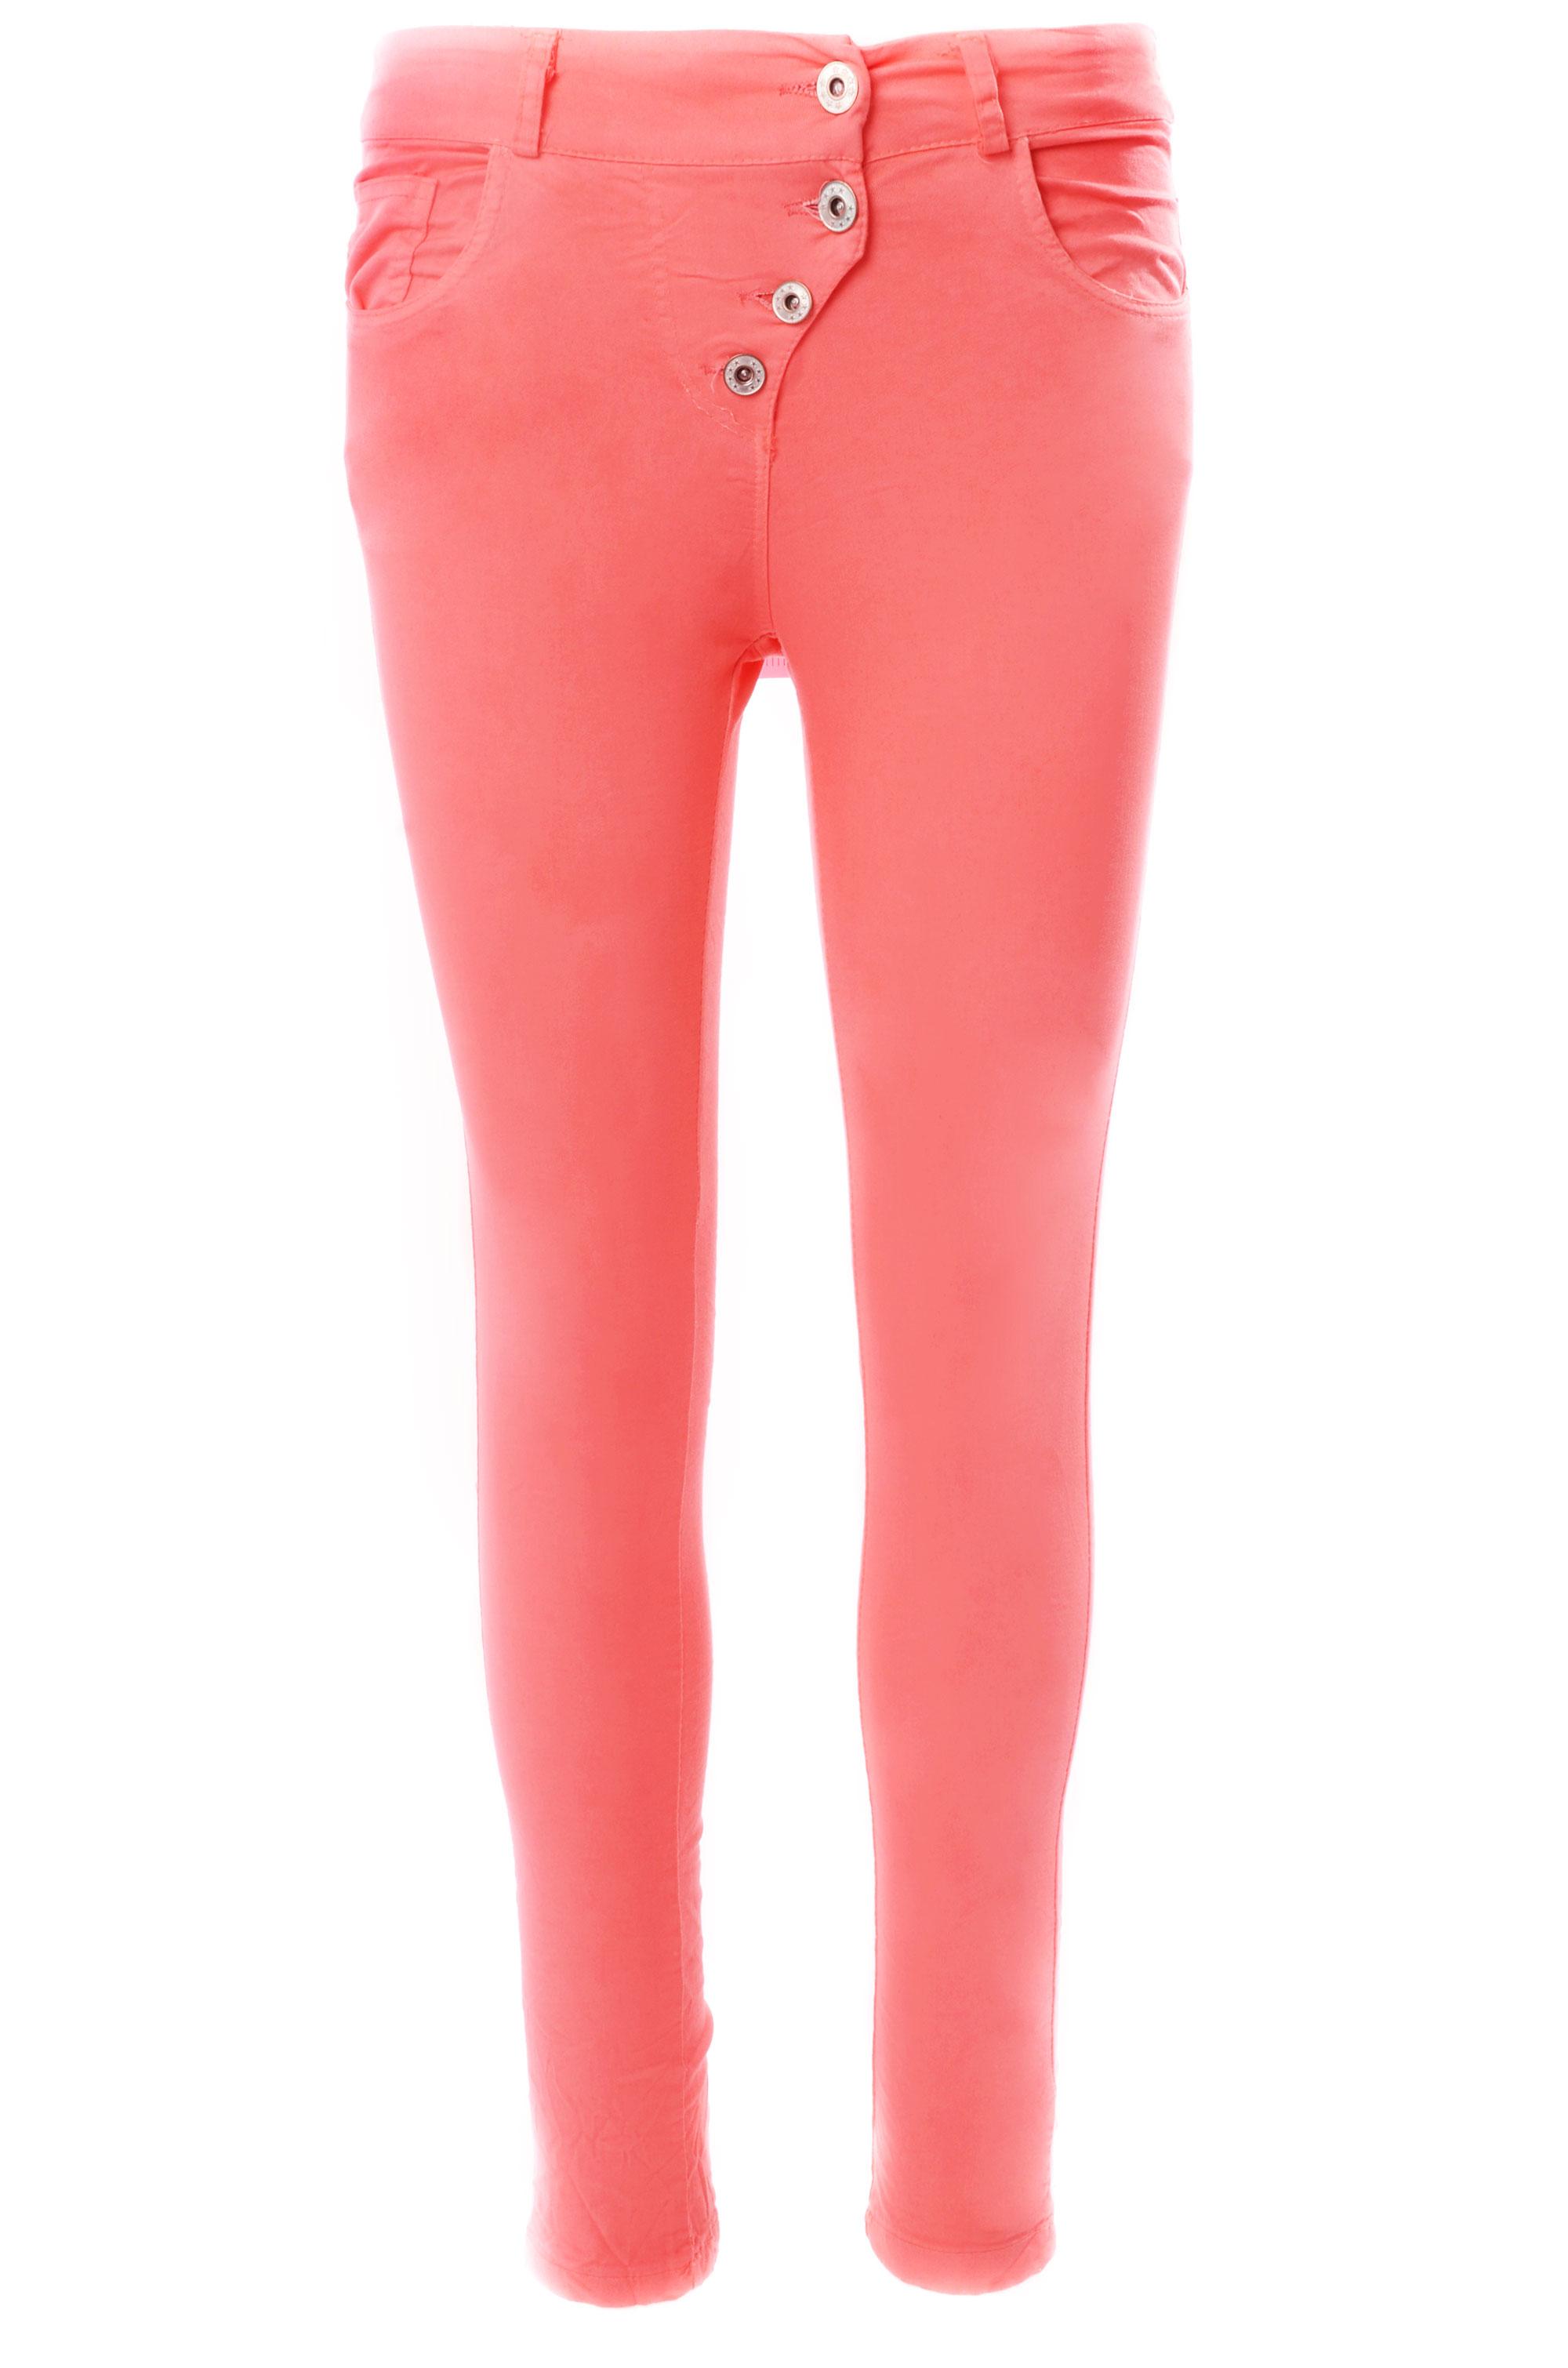 Spodnie - 10-2841 CORAL - Unisono